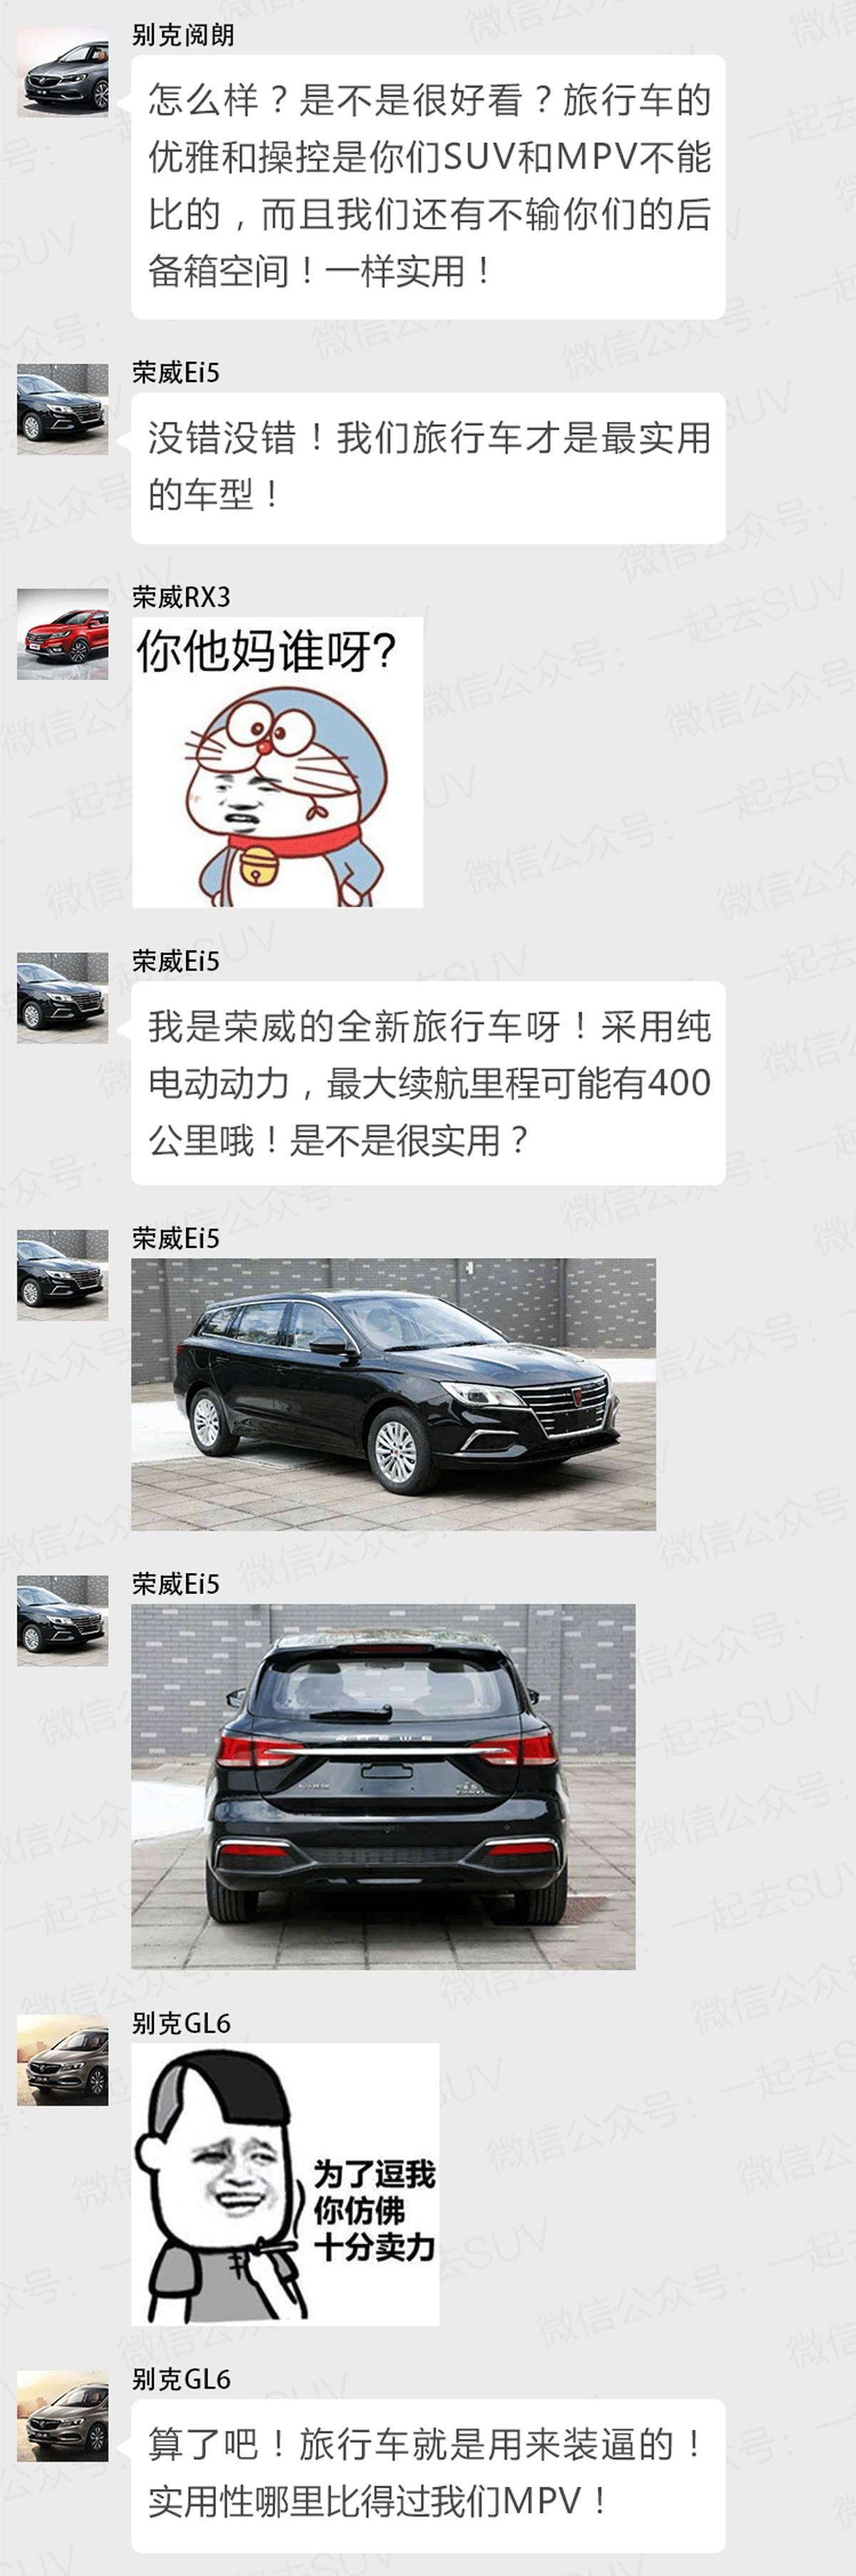 SUV、旅行车、MPV新车大撕逼!究竟谁更适合家用?